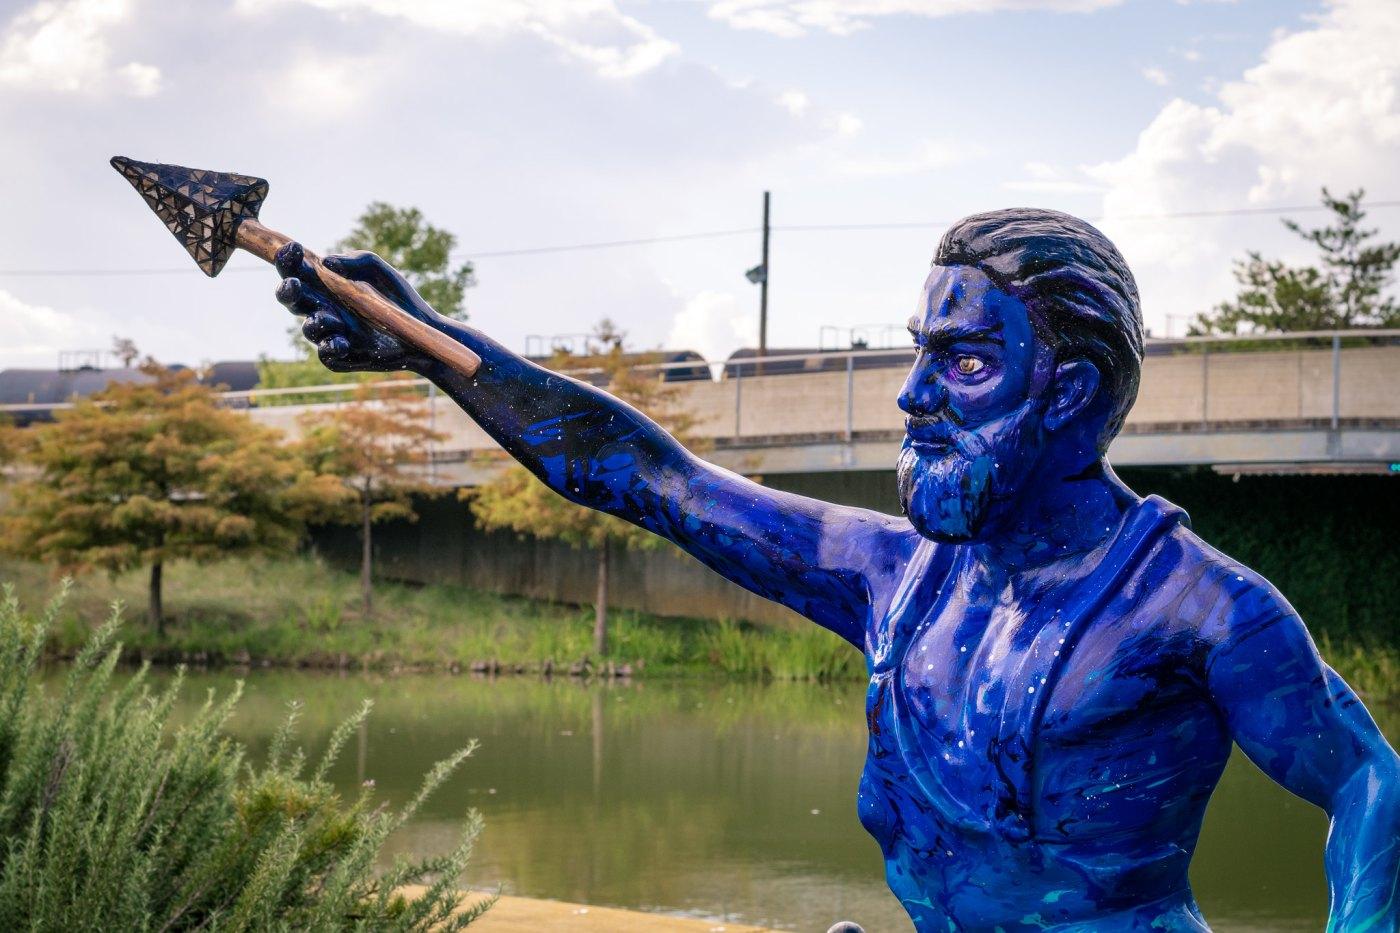 Vulcan statue at Railroad Park